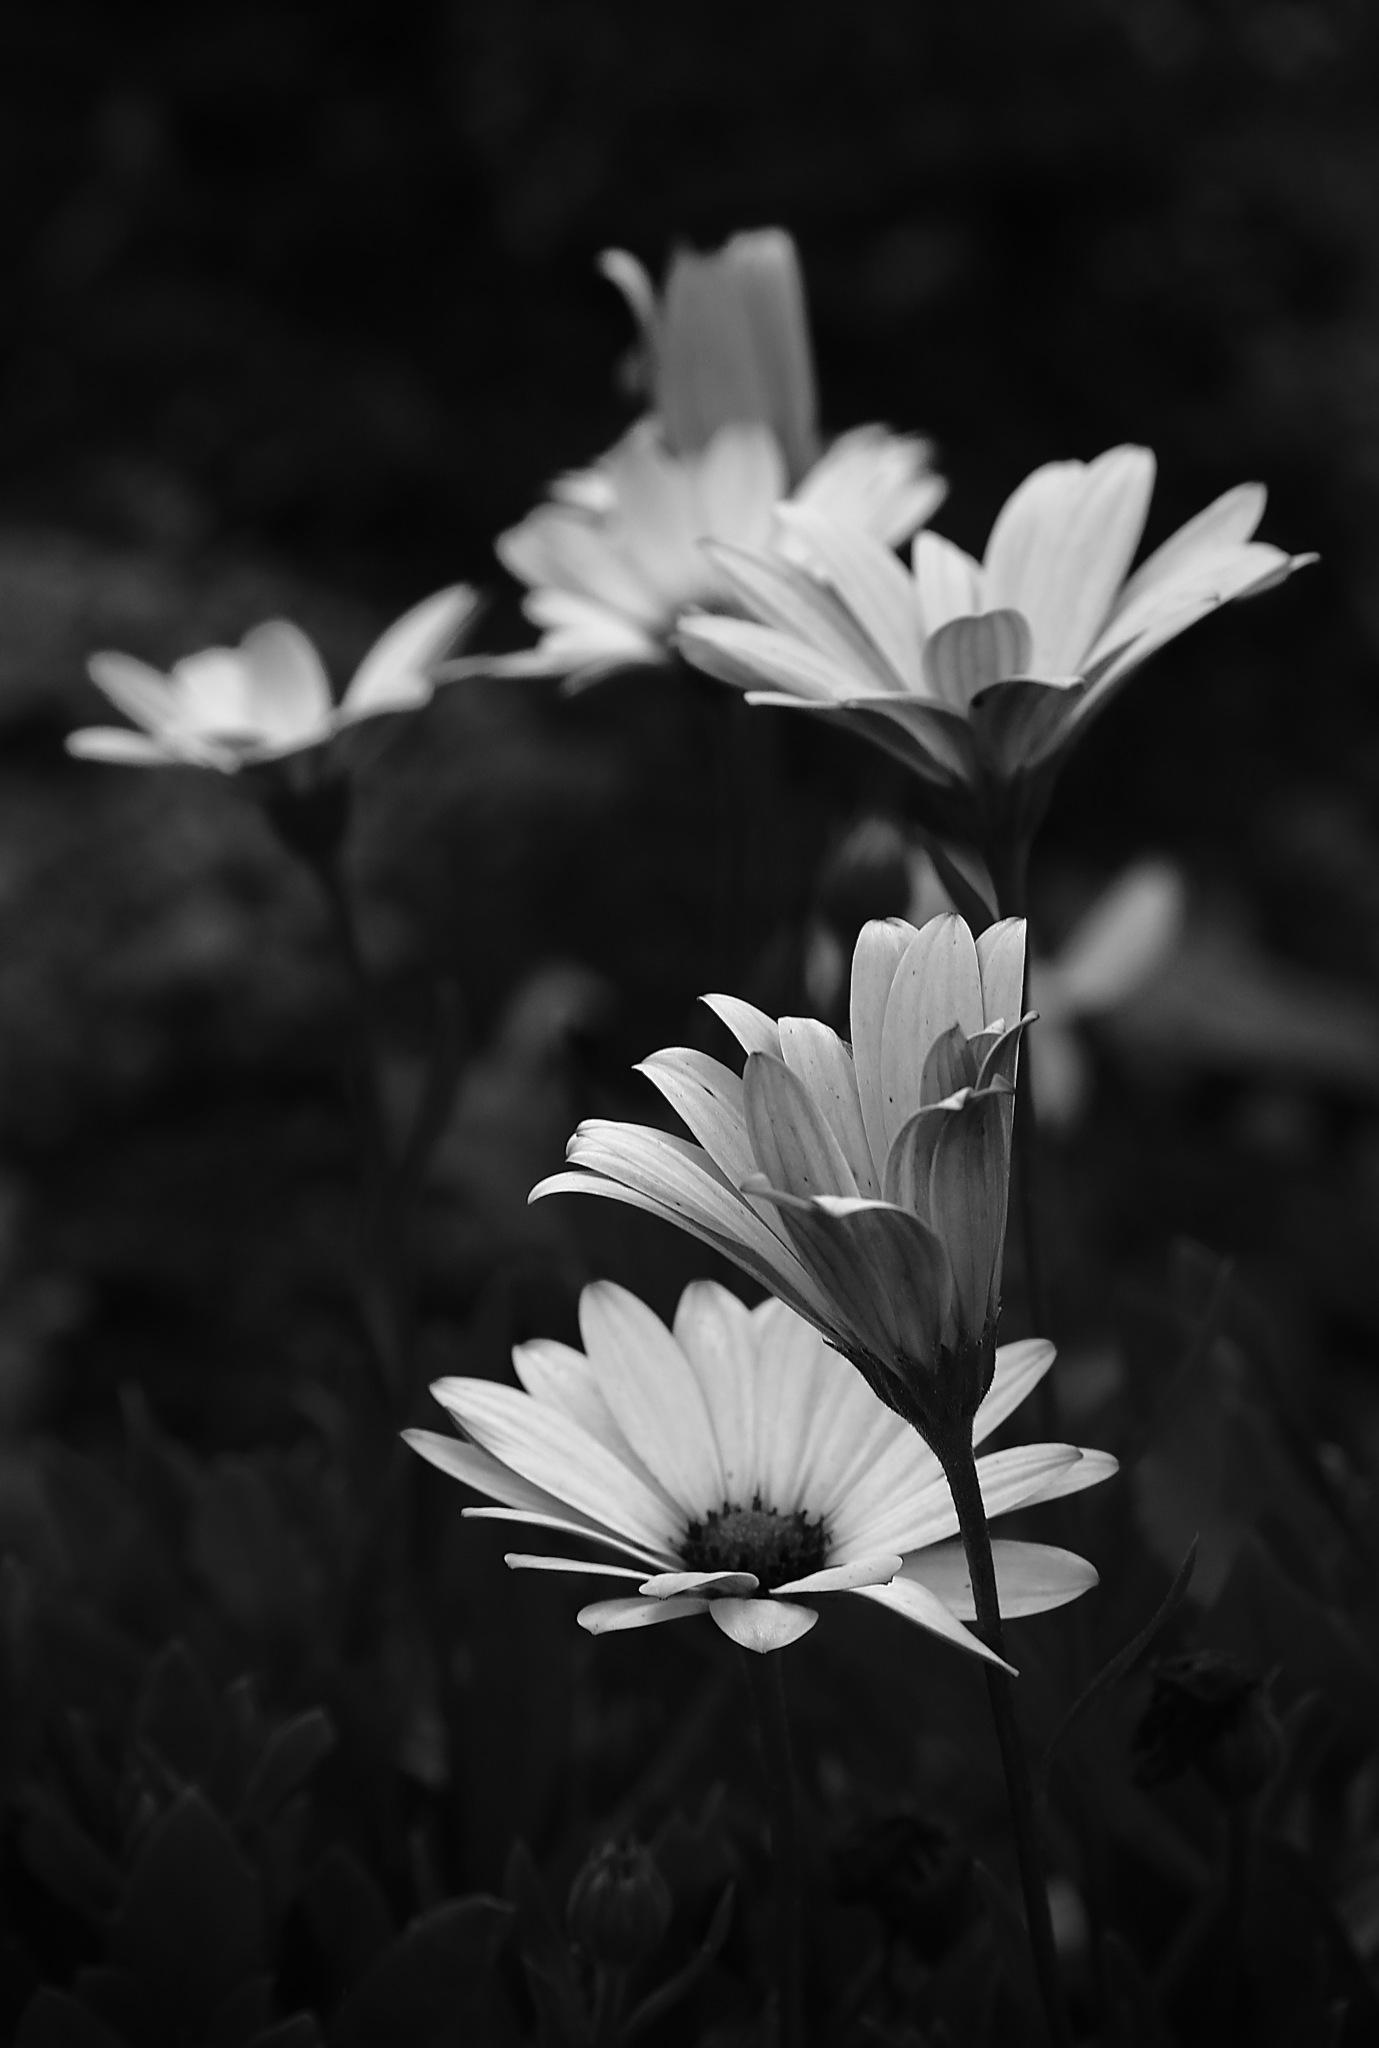 cvetovi by meteor14avgust